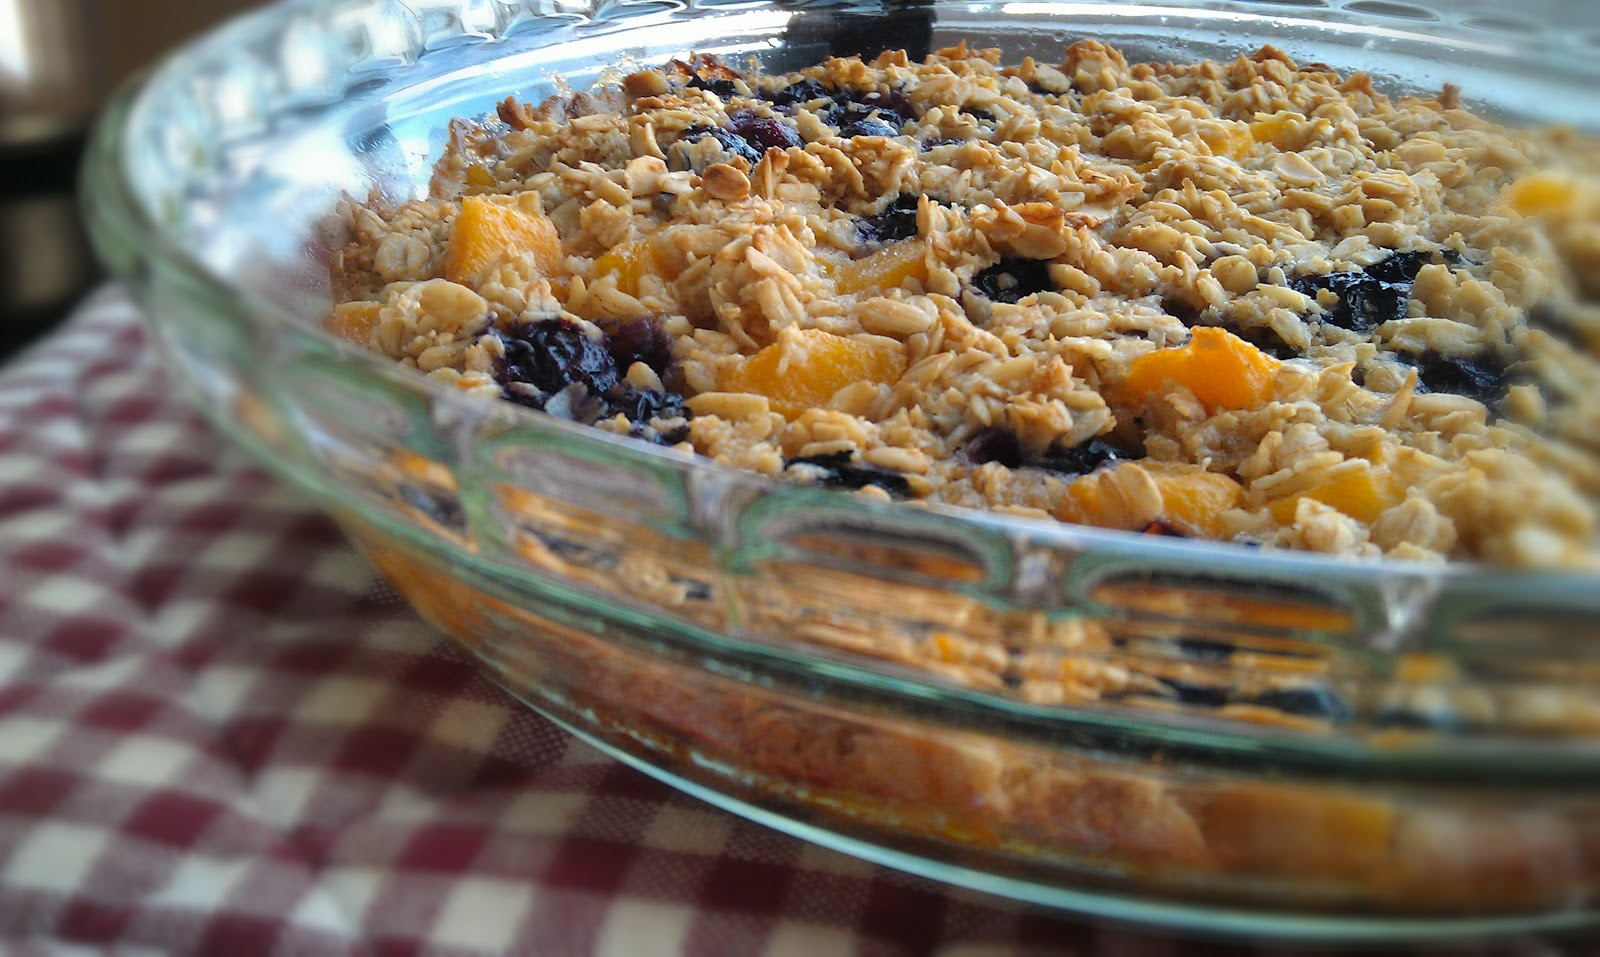 Egg Free Bakery: Egg Free Baked Blueberry & Peach Oatmeal